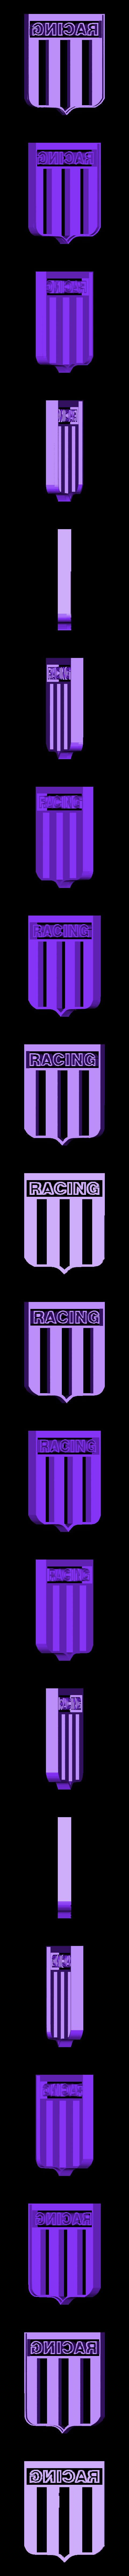 Racing-Relleno.stl Download STL file Cookies Cutter Racing, Cookies Cutter Racing • 3D printing template, diegox484